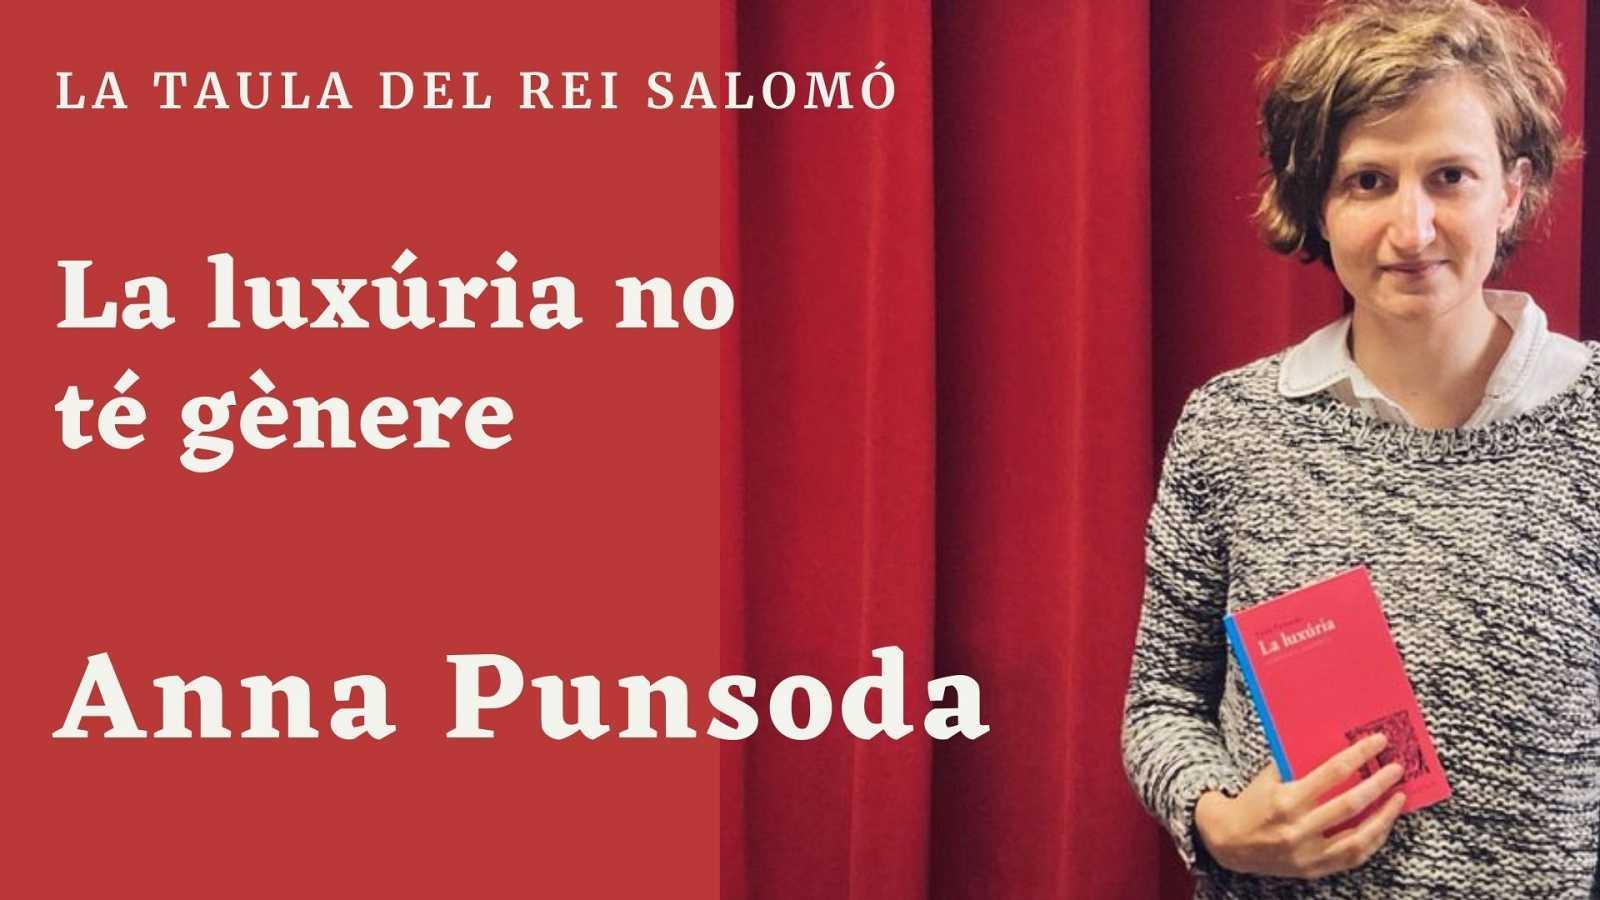 Wonderland - La taula del Rei Salomó. Entrevista a Anna Punsoda